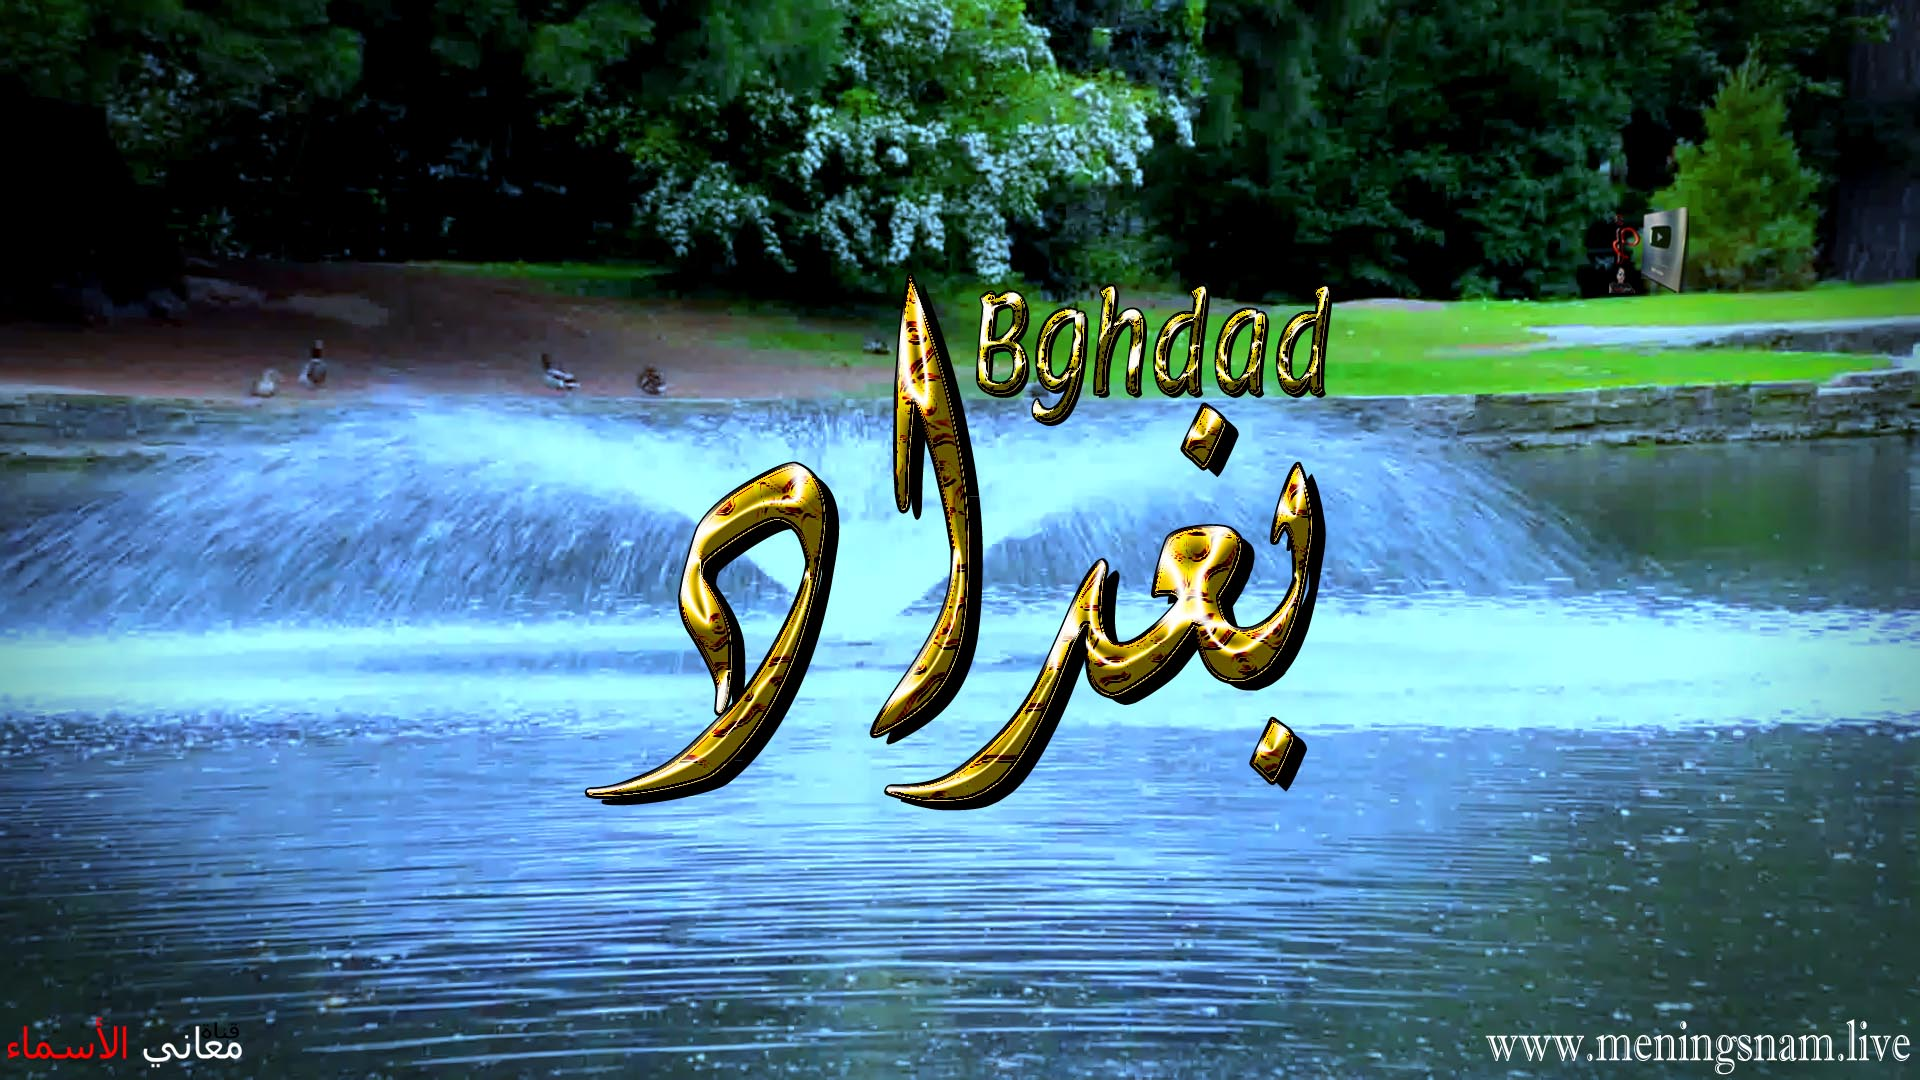 معنى اسم بغداد وصفات حامل هذا الاسم Baghdad,